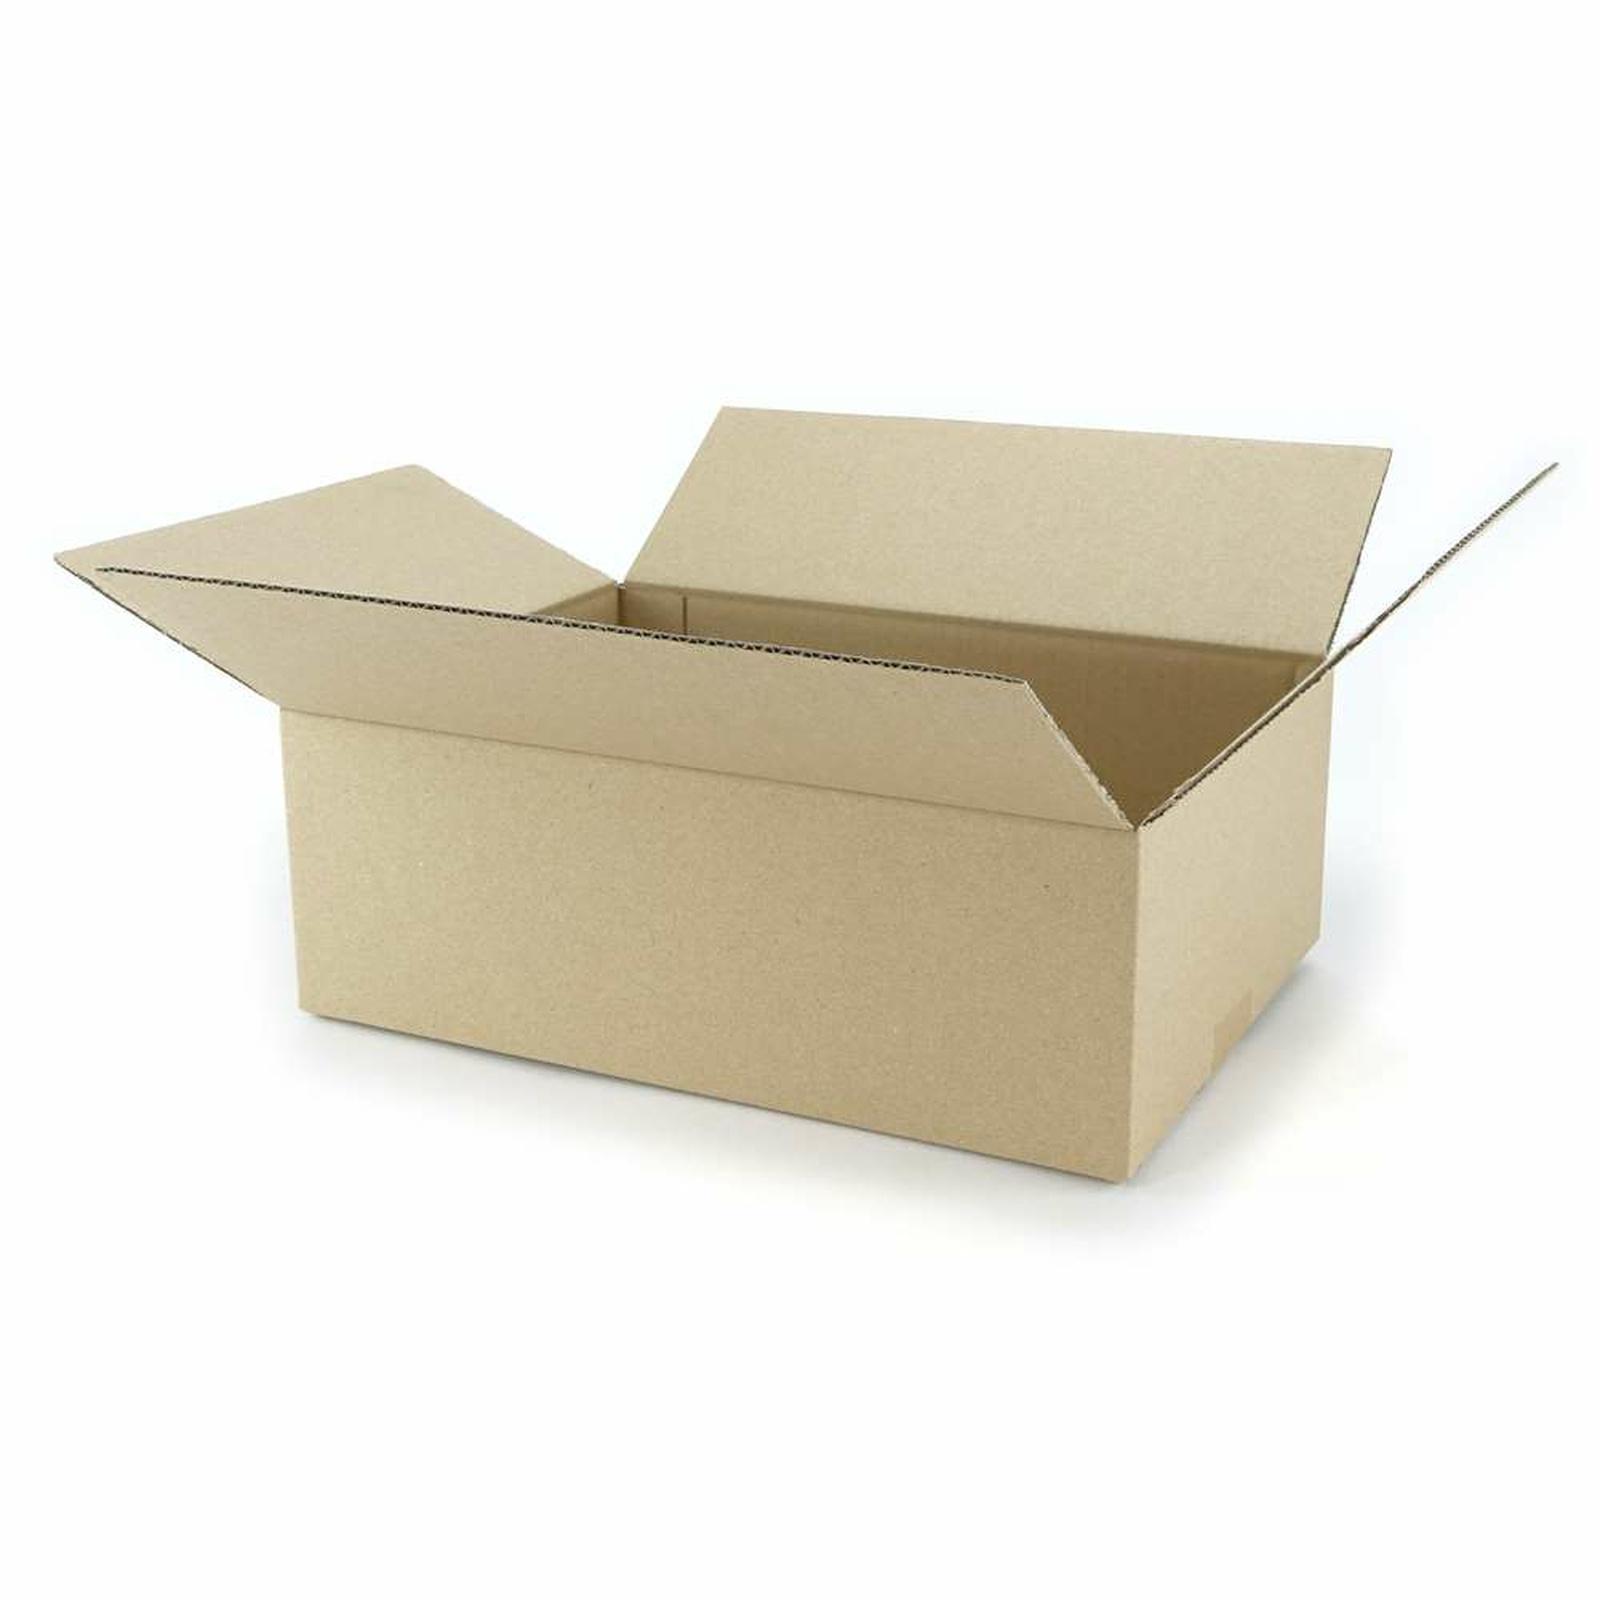 einwellige kartons 350x250x120 mm g nstig kaufen 0 27. Black Bedroom Furniture Sets. Home Design Ideas